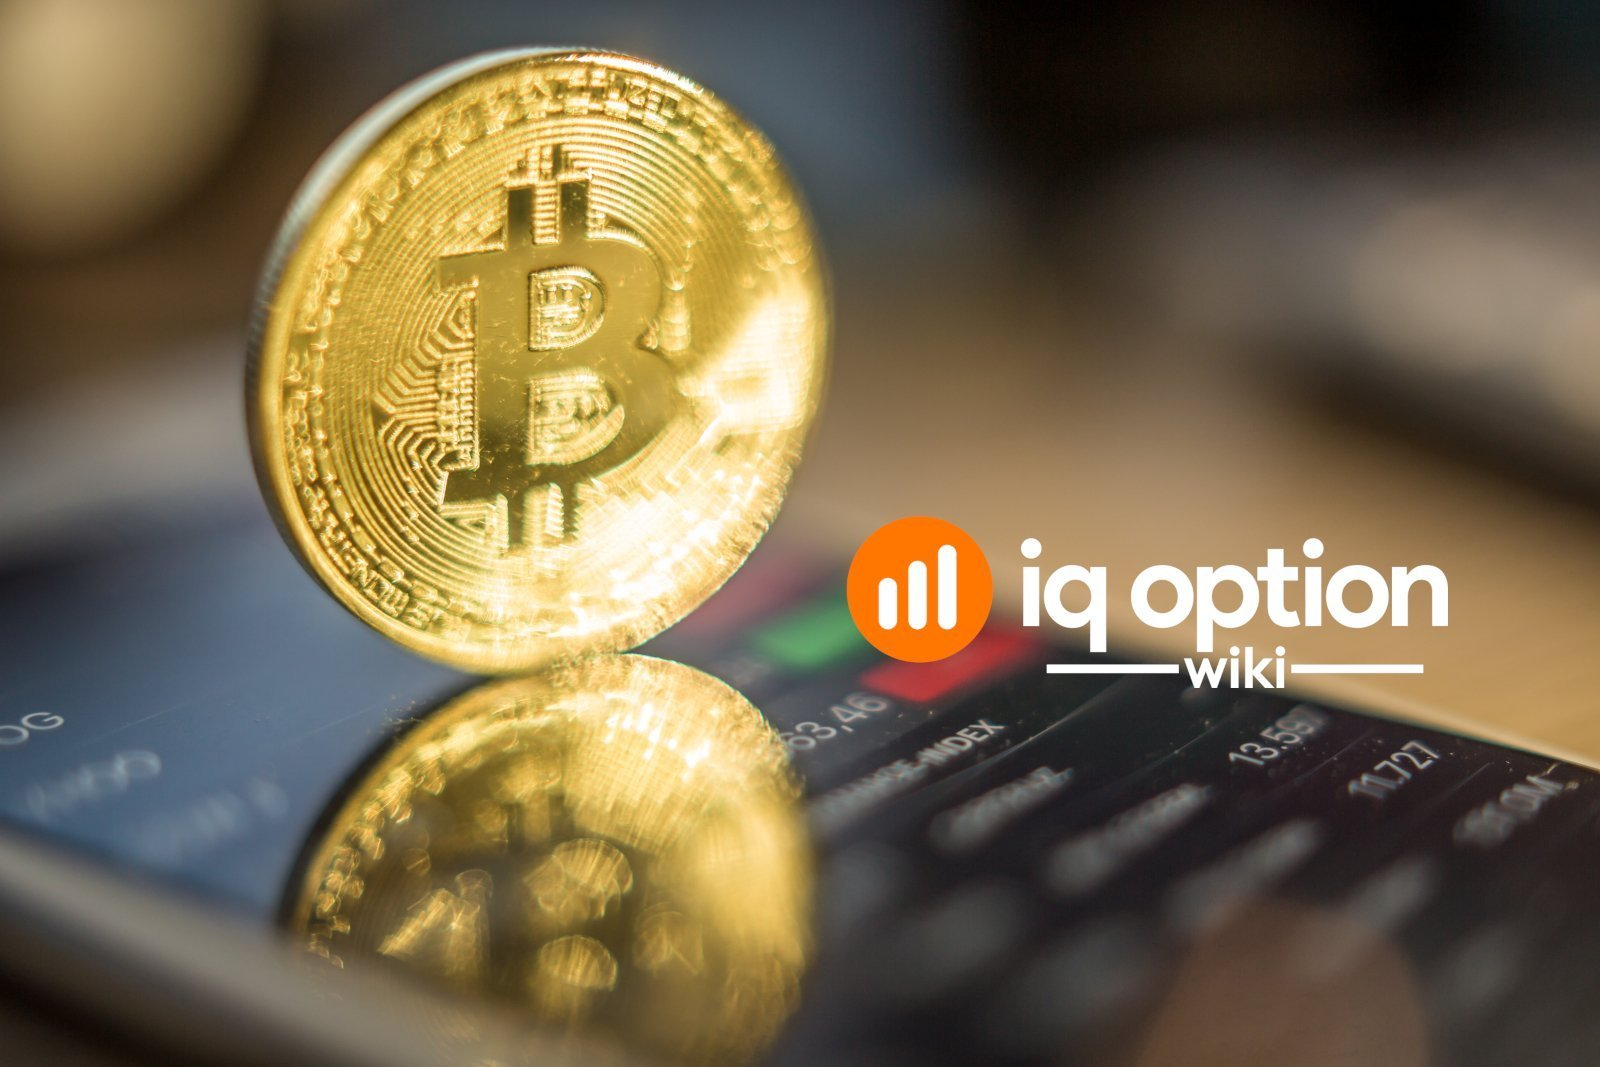 bitcoin gergo di trading